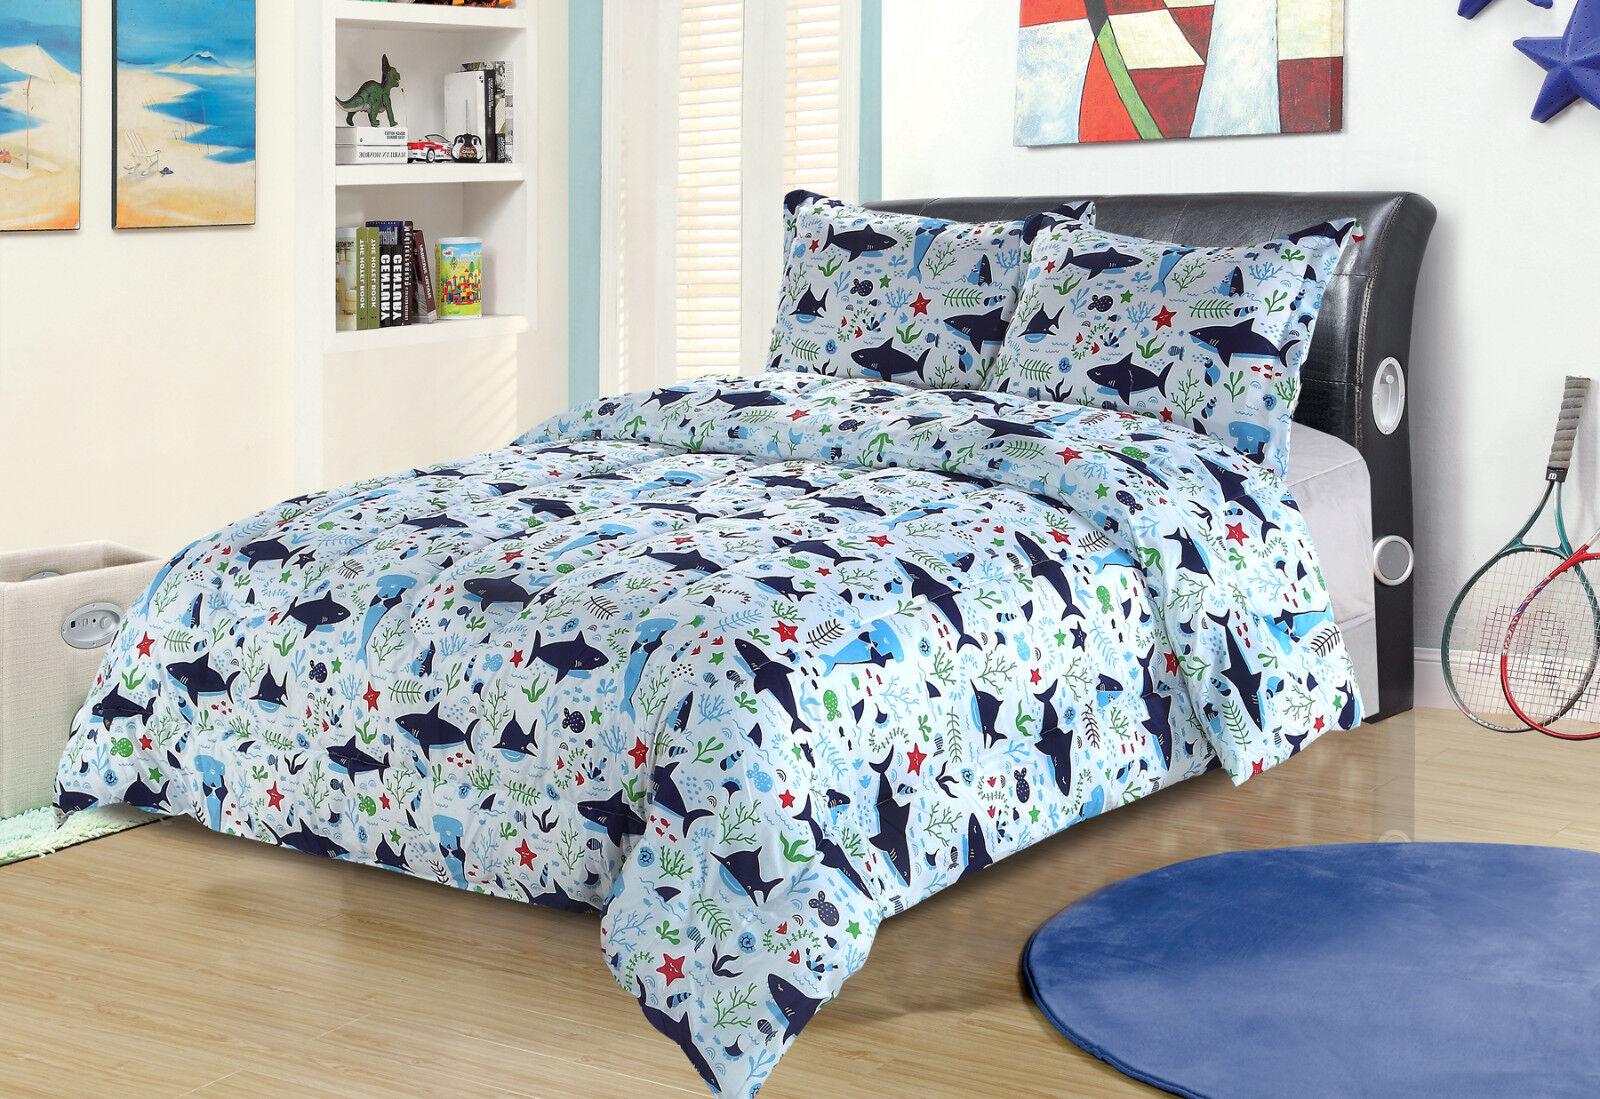 Twin or Full/Queen Shark Bedding Comforter Bed Set Blue Gree